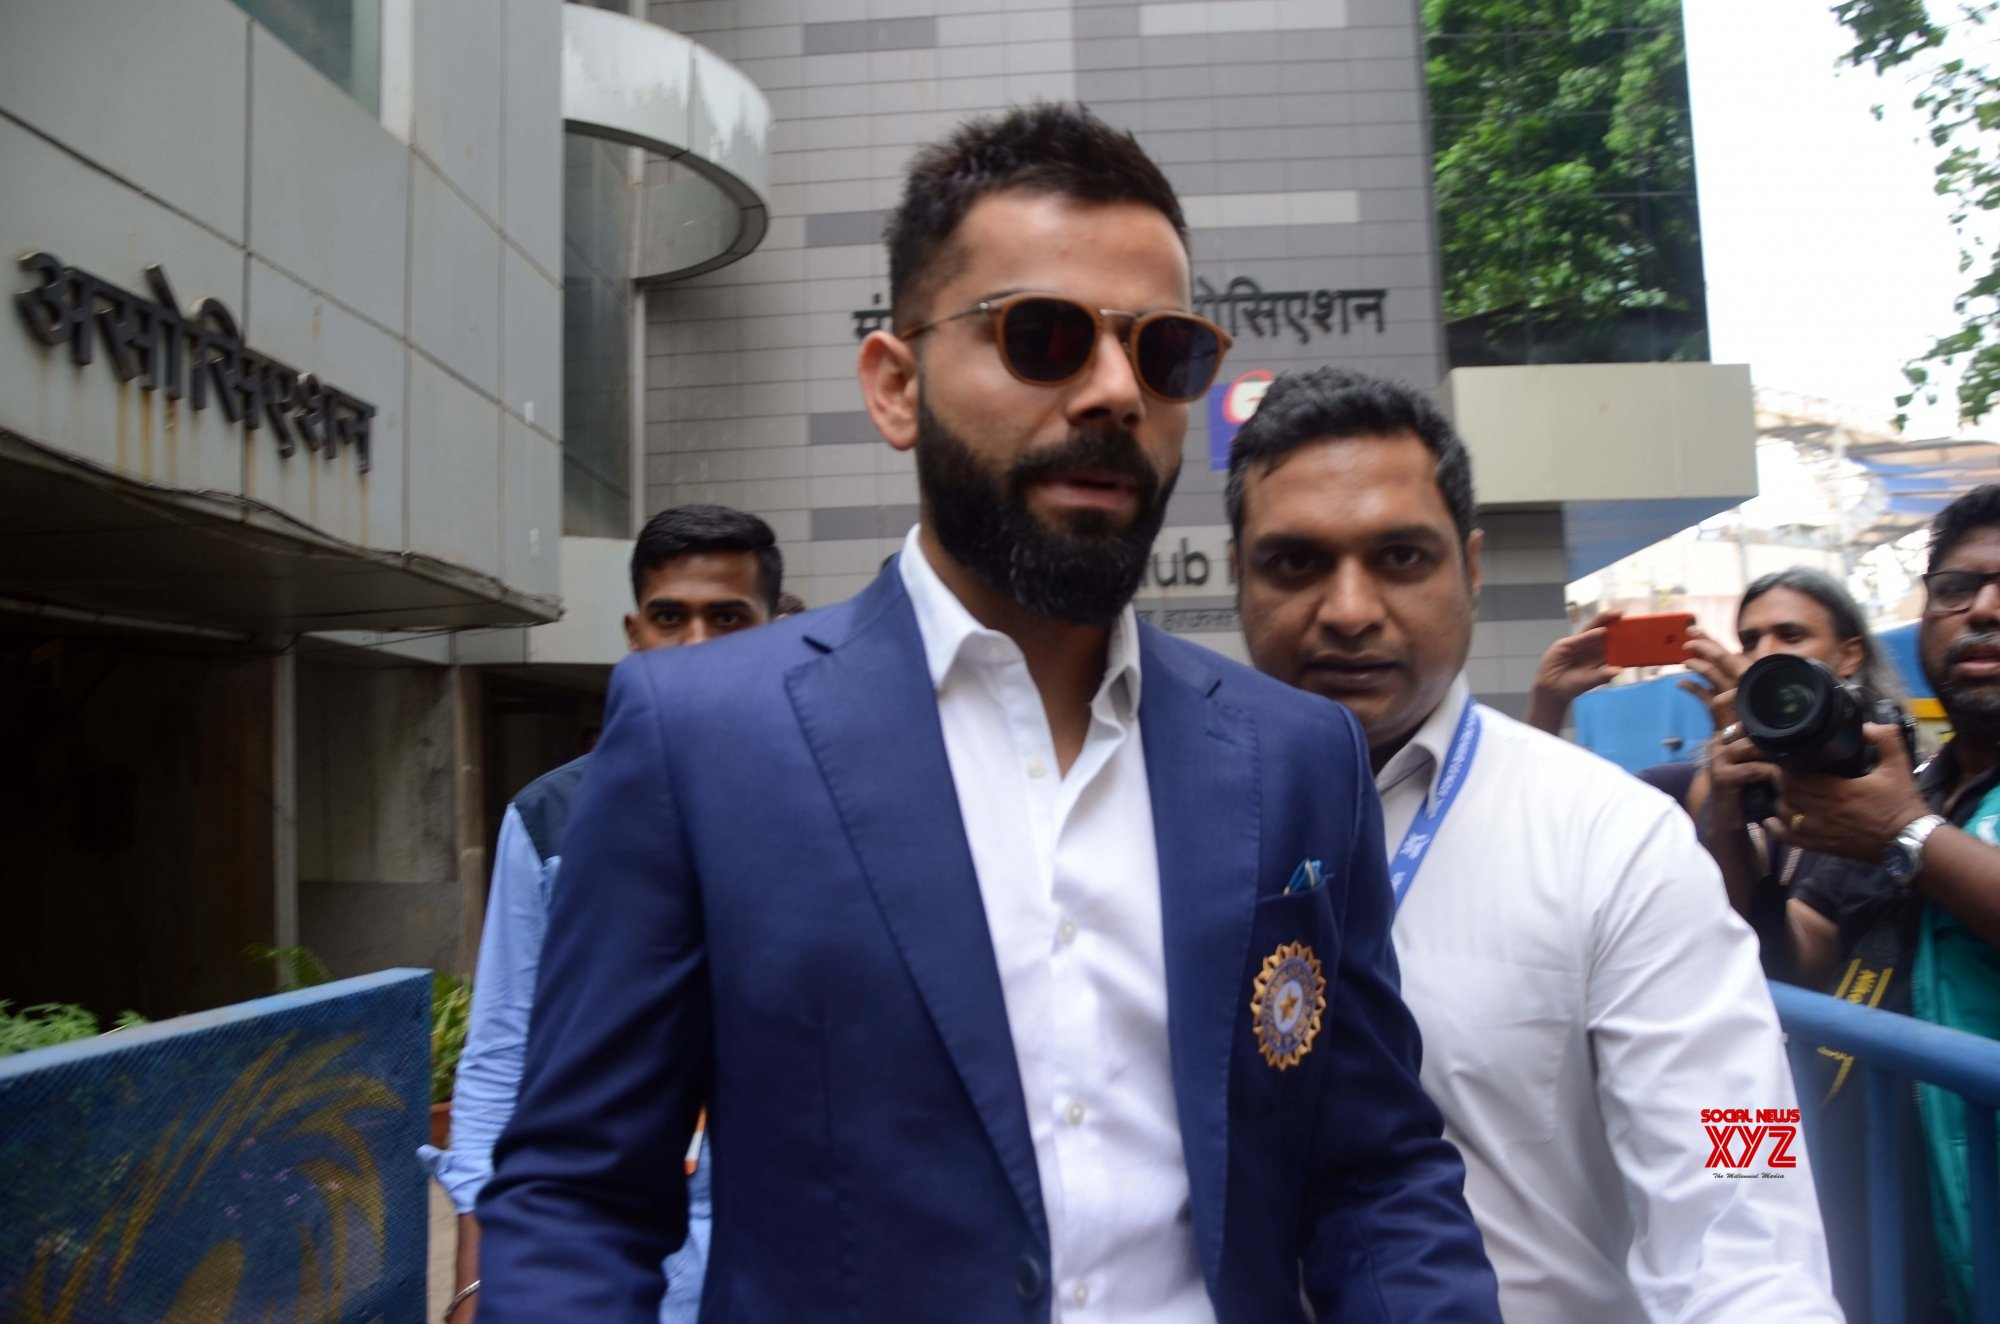 Mumbai: India squad announced for World Cup 2019 - Virat Kohli at BCCI #Gallery